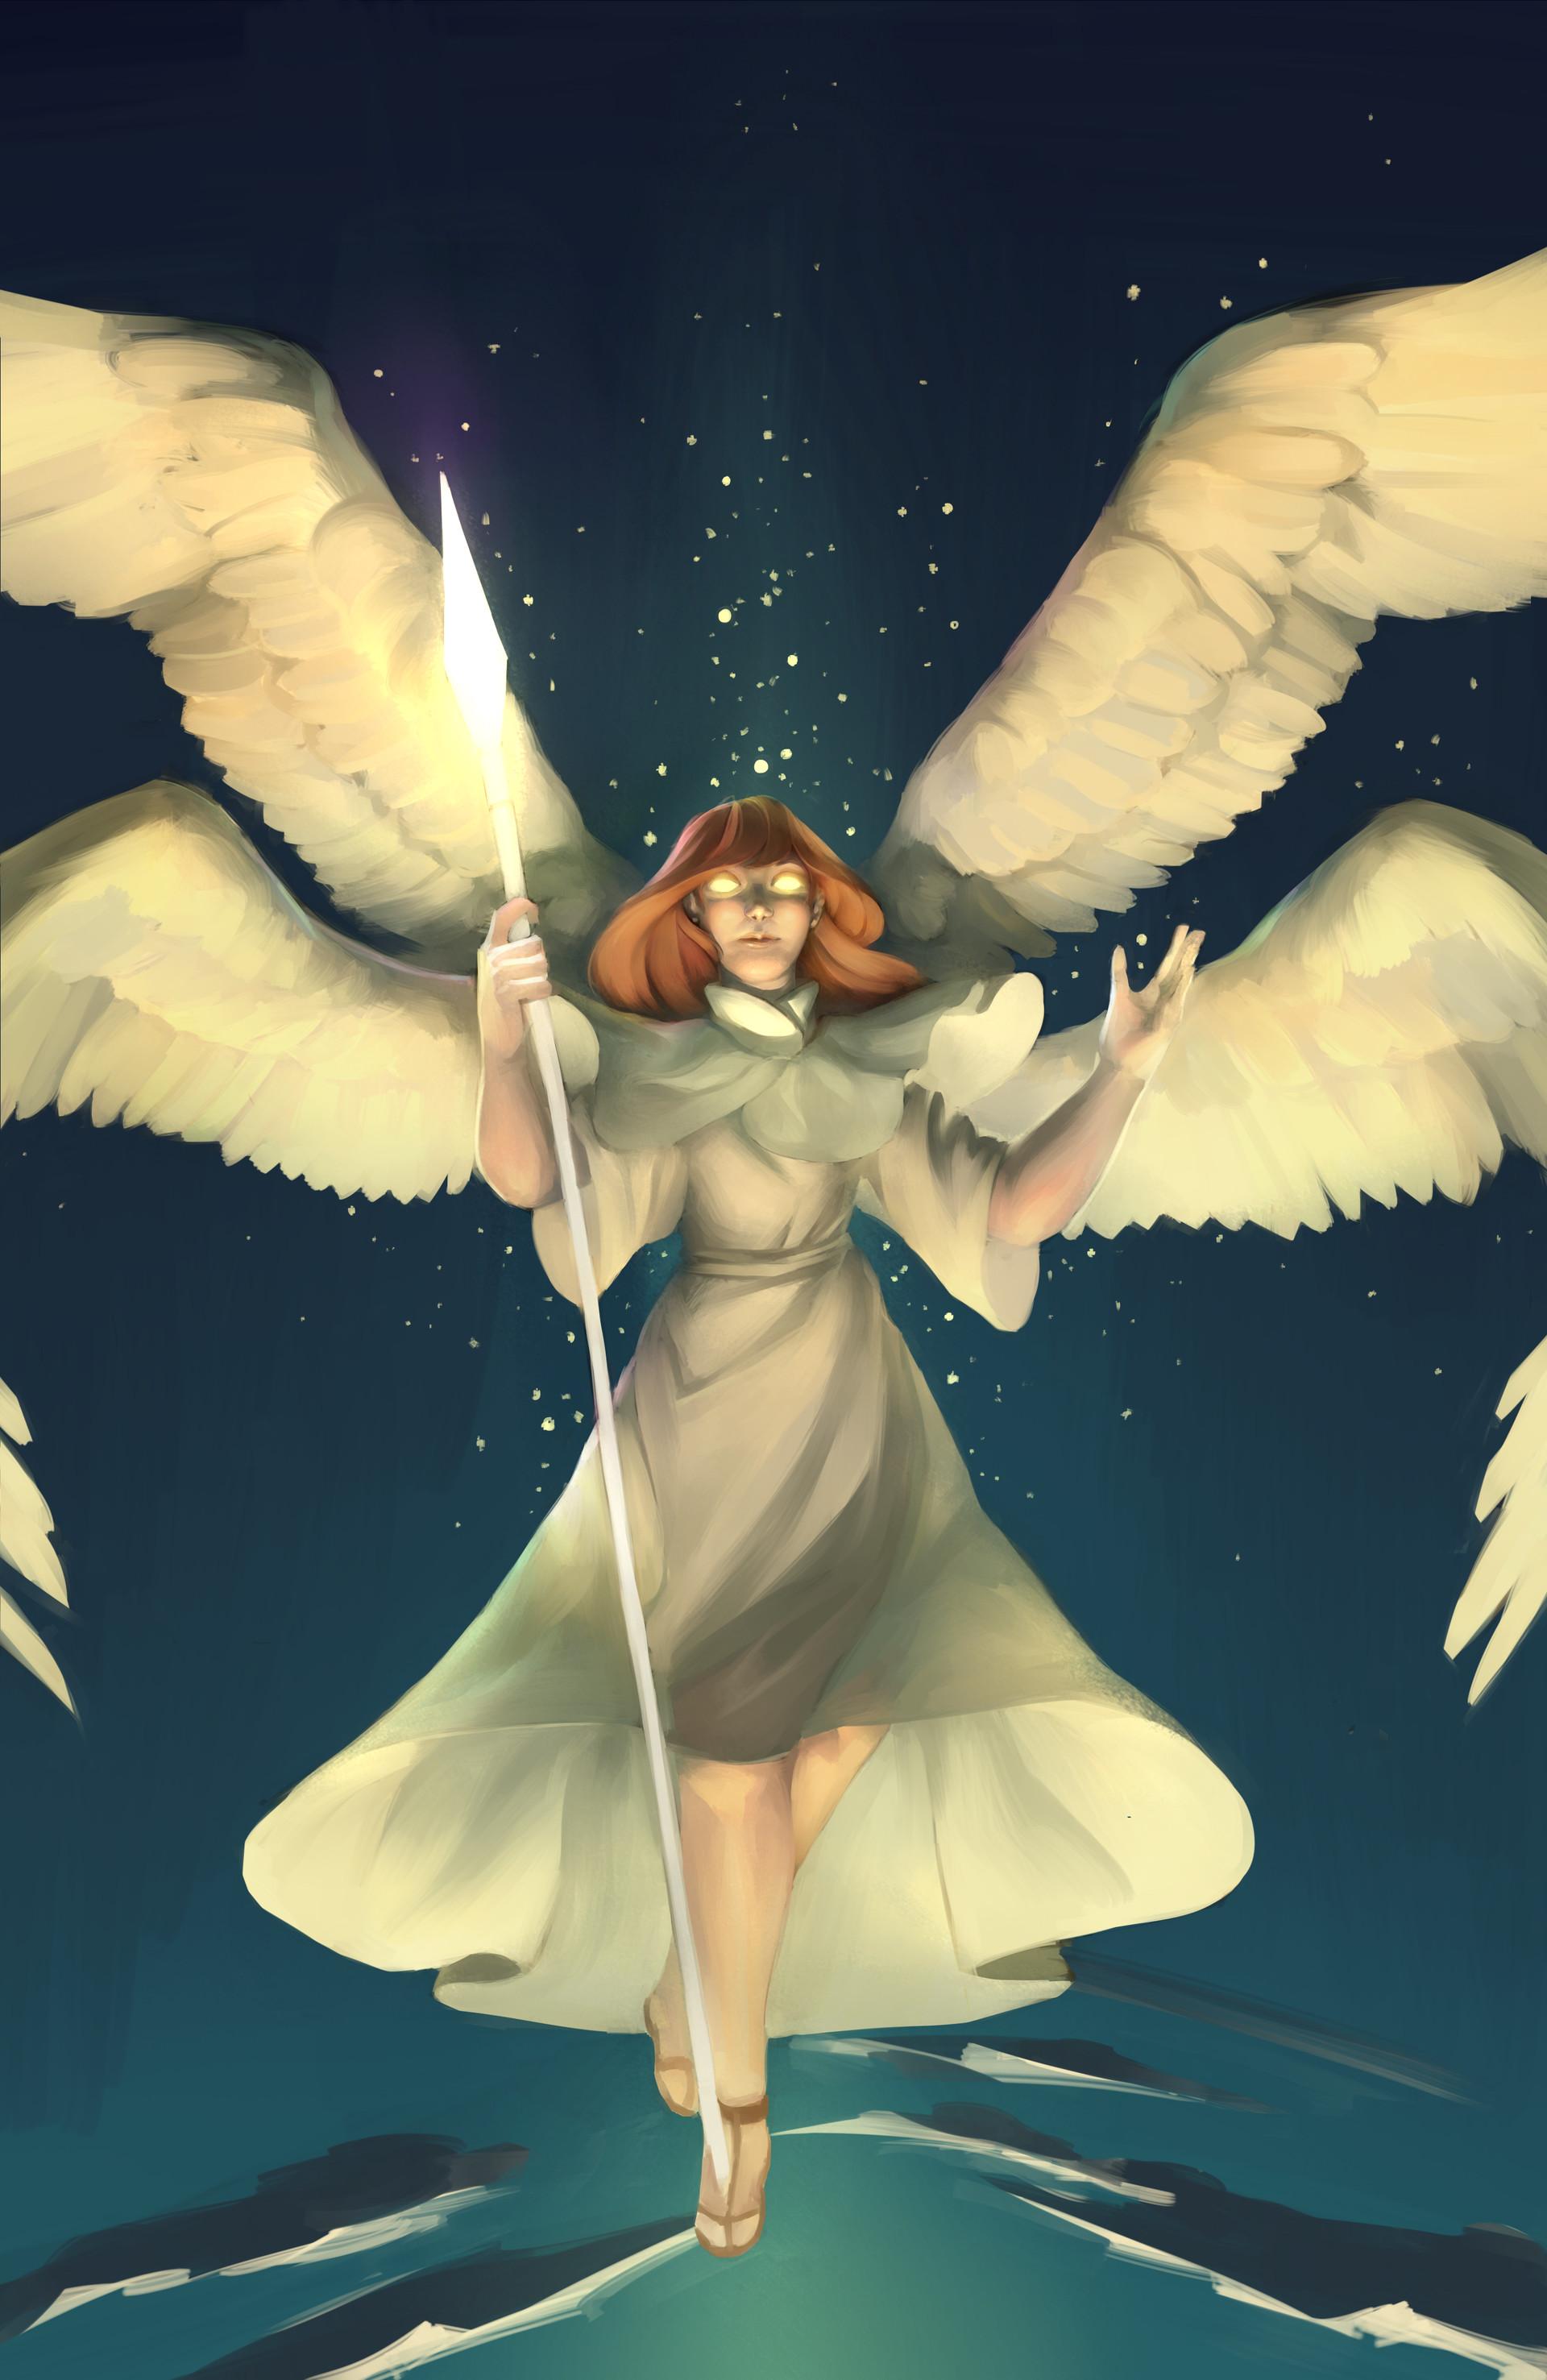 Tessa low akera goddess